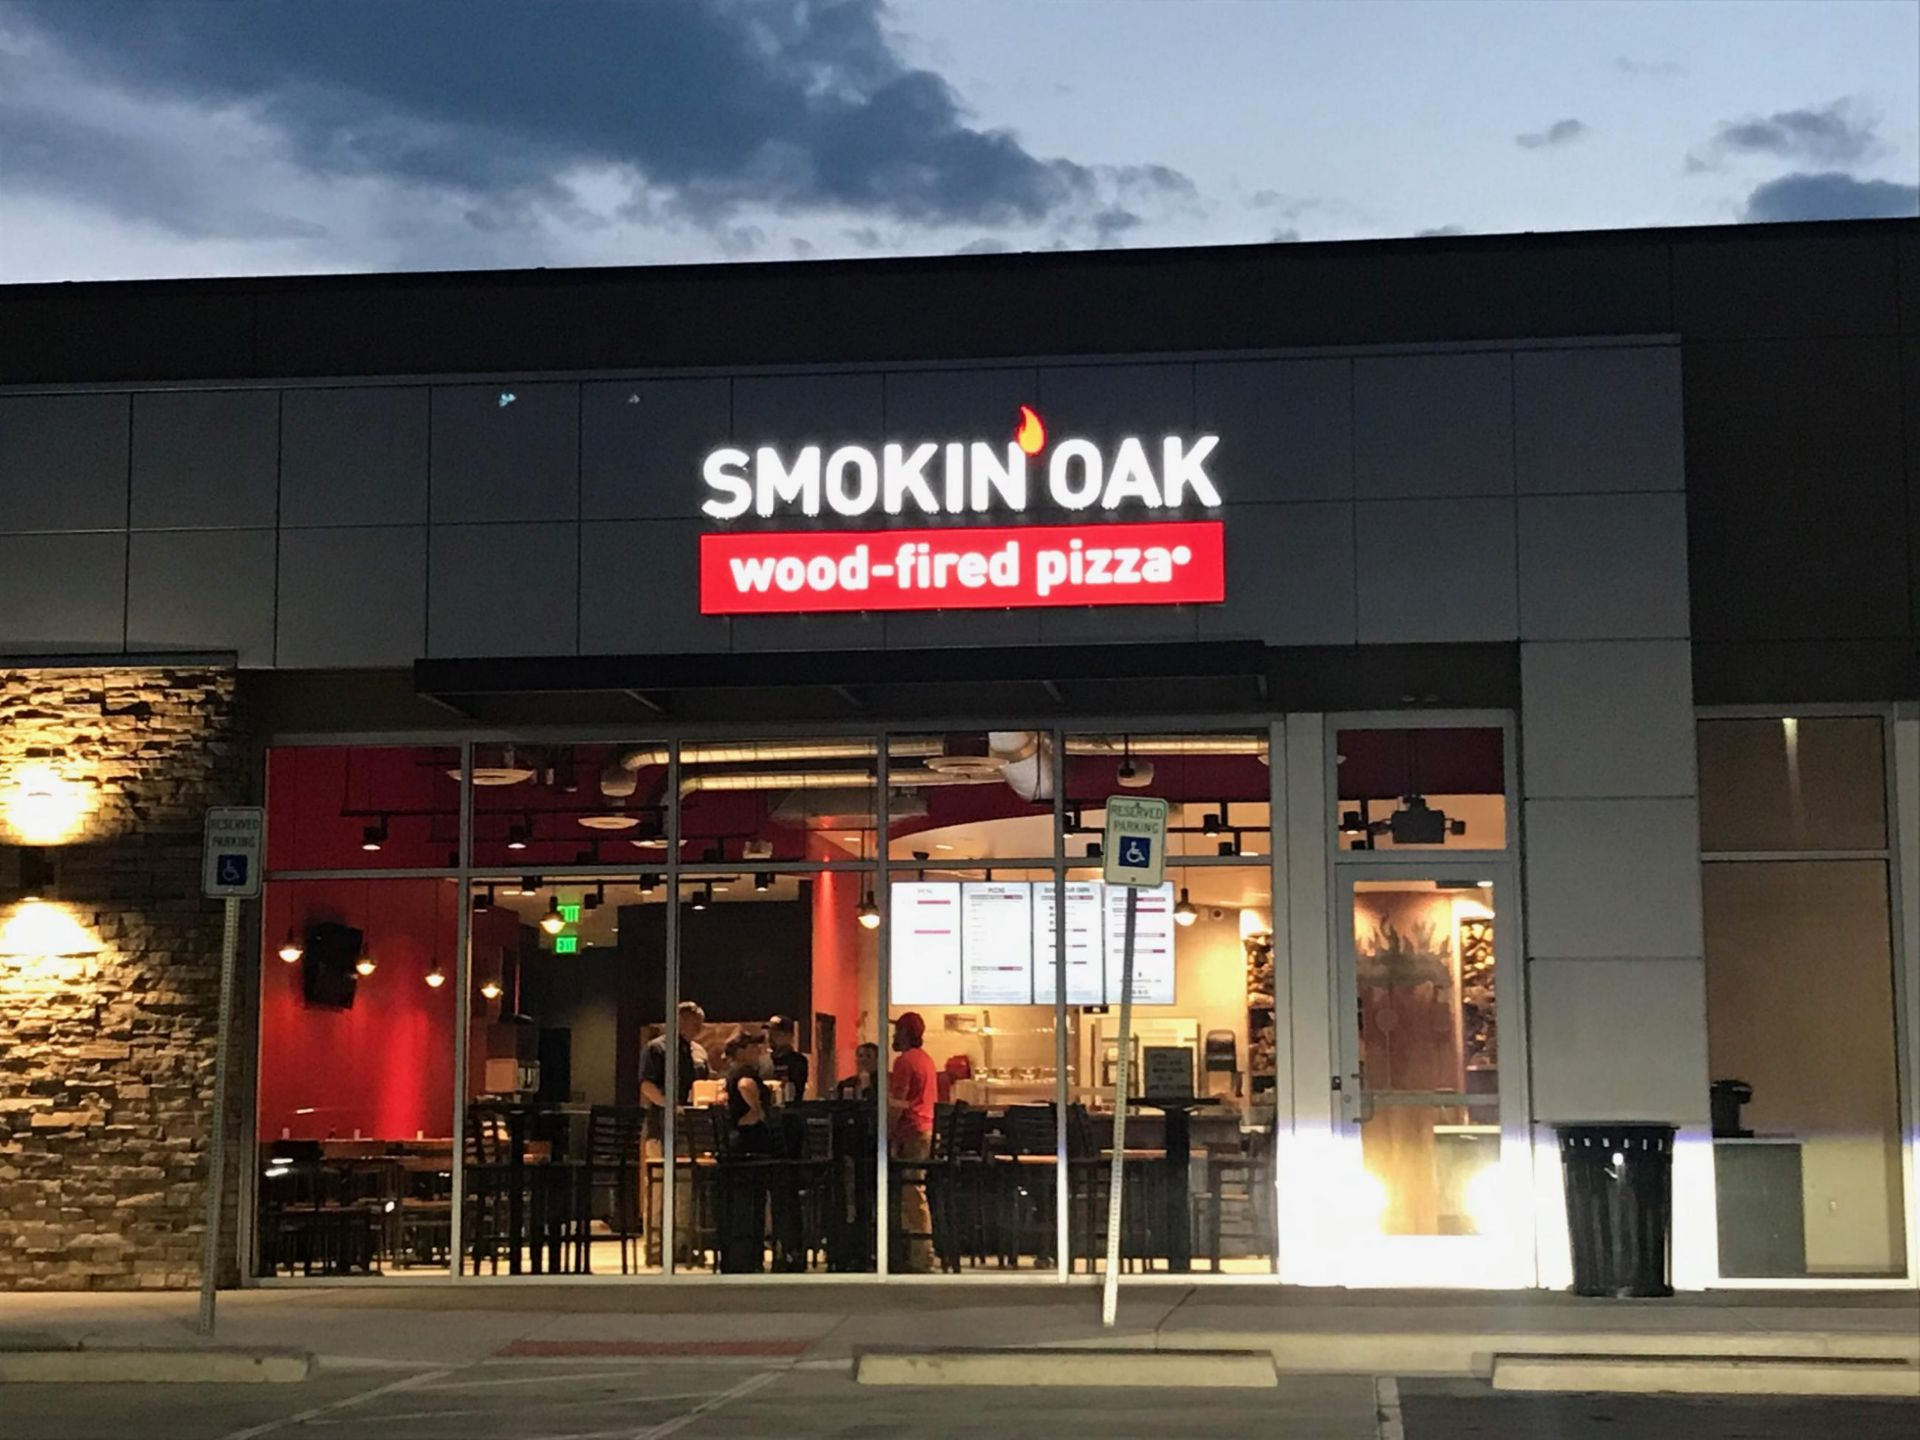 Smokin' Oak Wood-Fired Pizza Firing Up Second Colorado Location